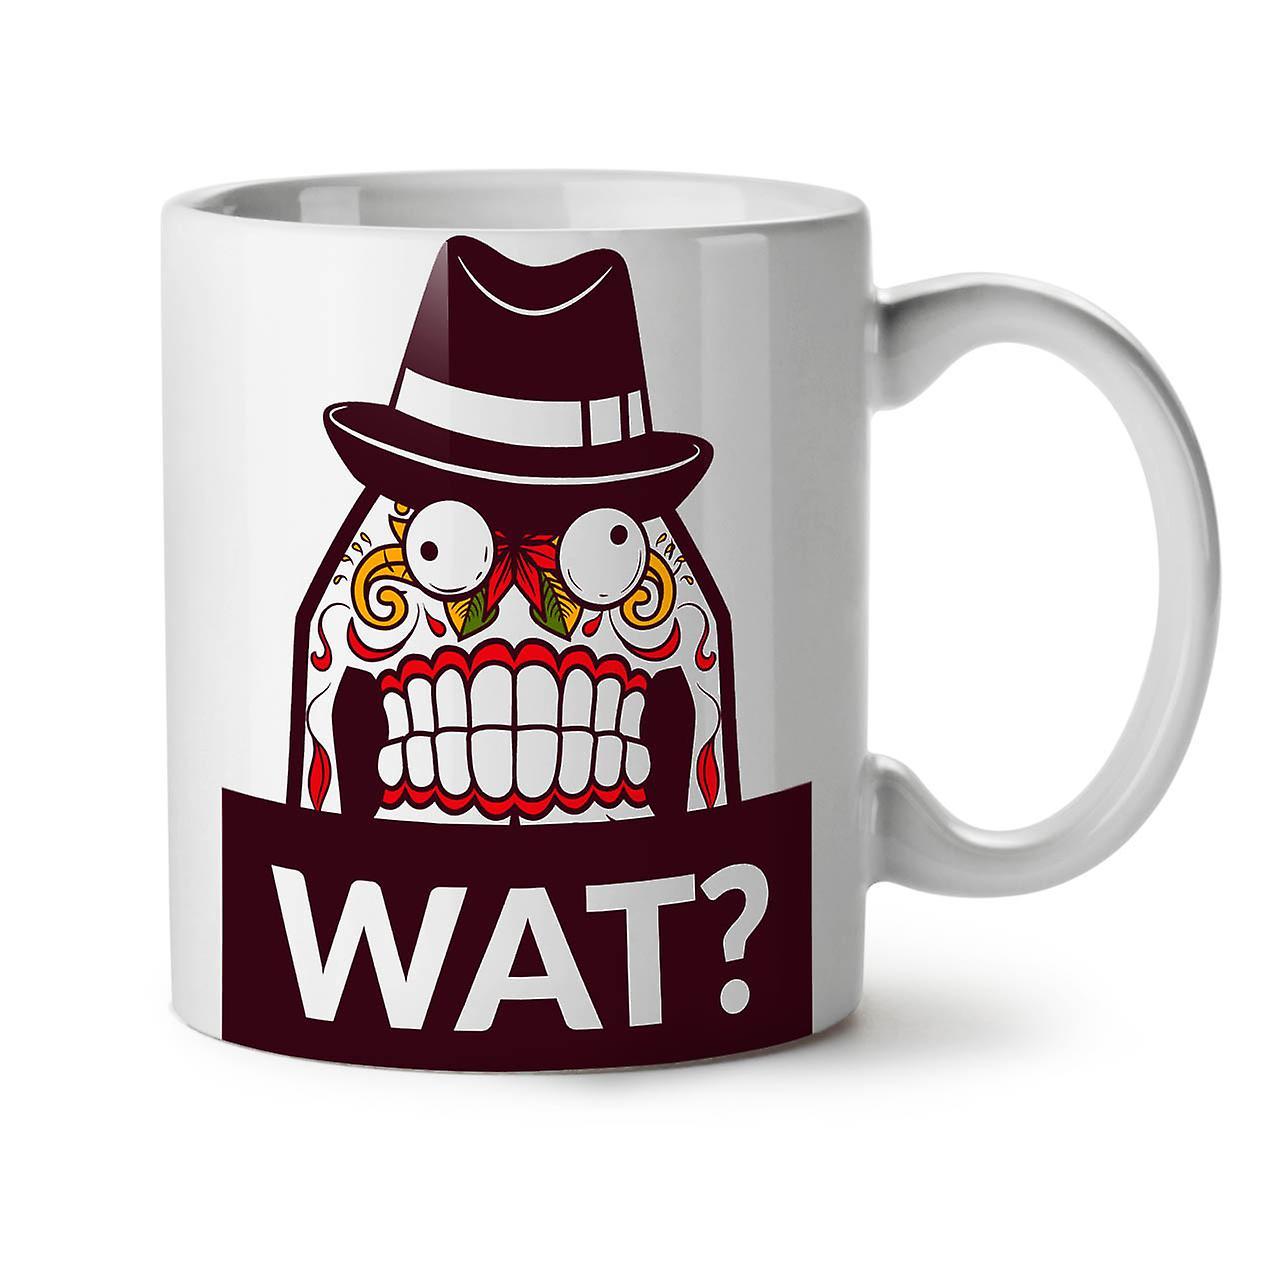 Skull 11 OzWellcoda Funny Tea Coffee What New White Mug Ceramic ulF1Jc53TK